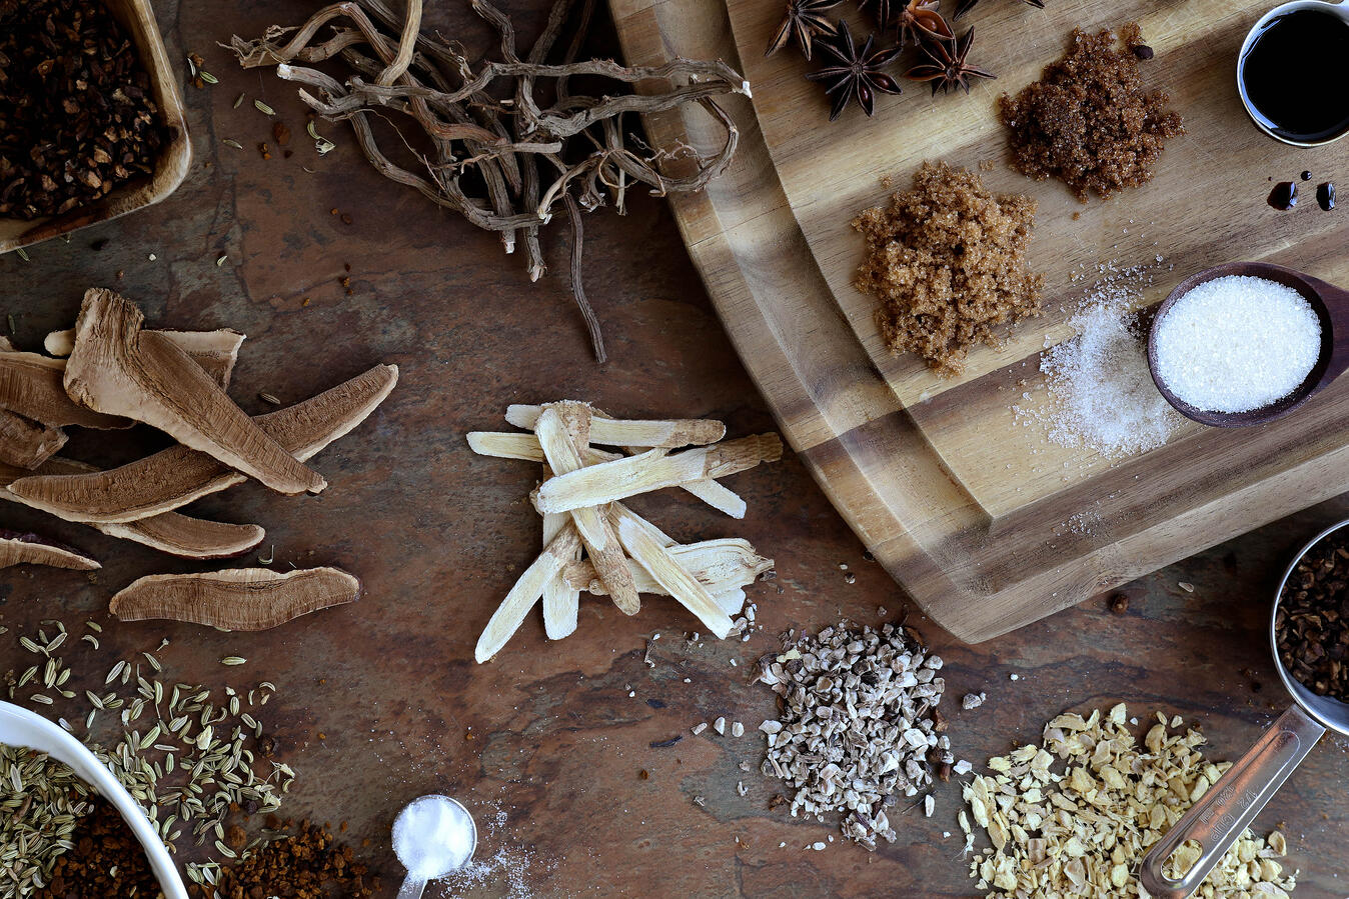 Root beer ingredients including astragalus, reishi, and brown sugar.